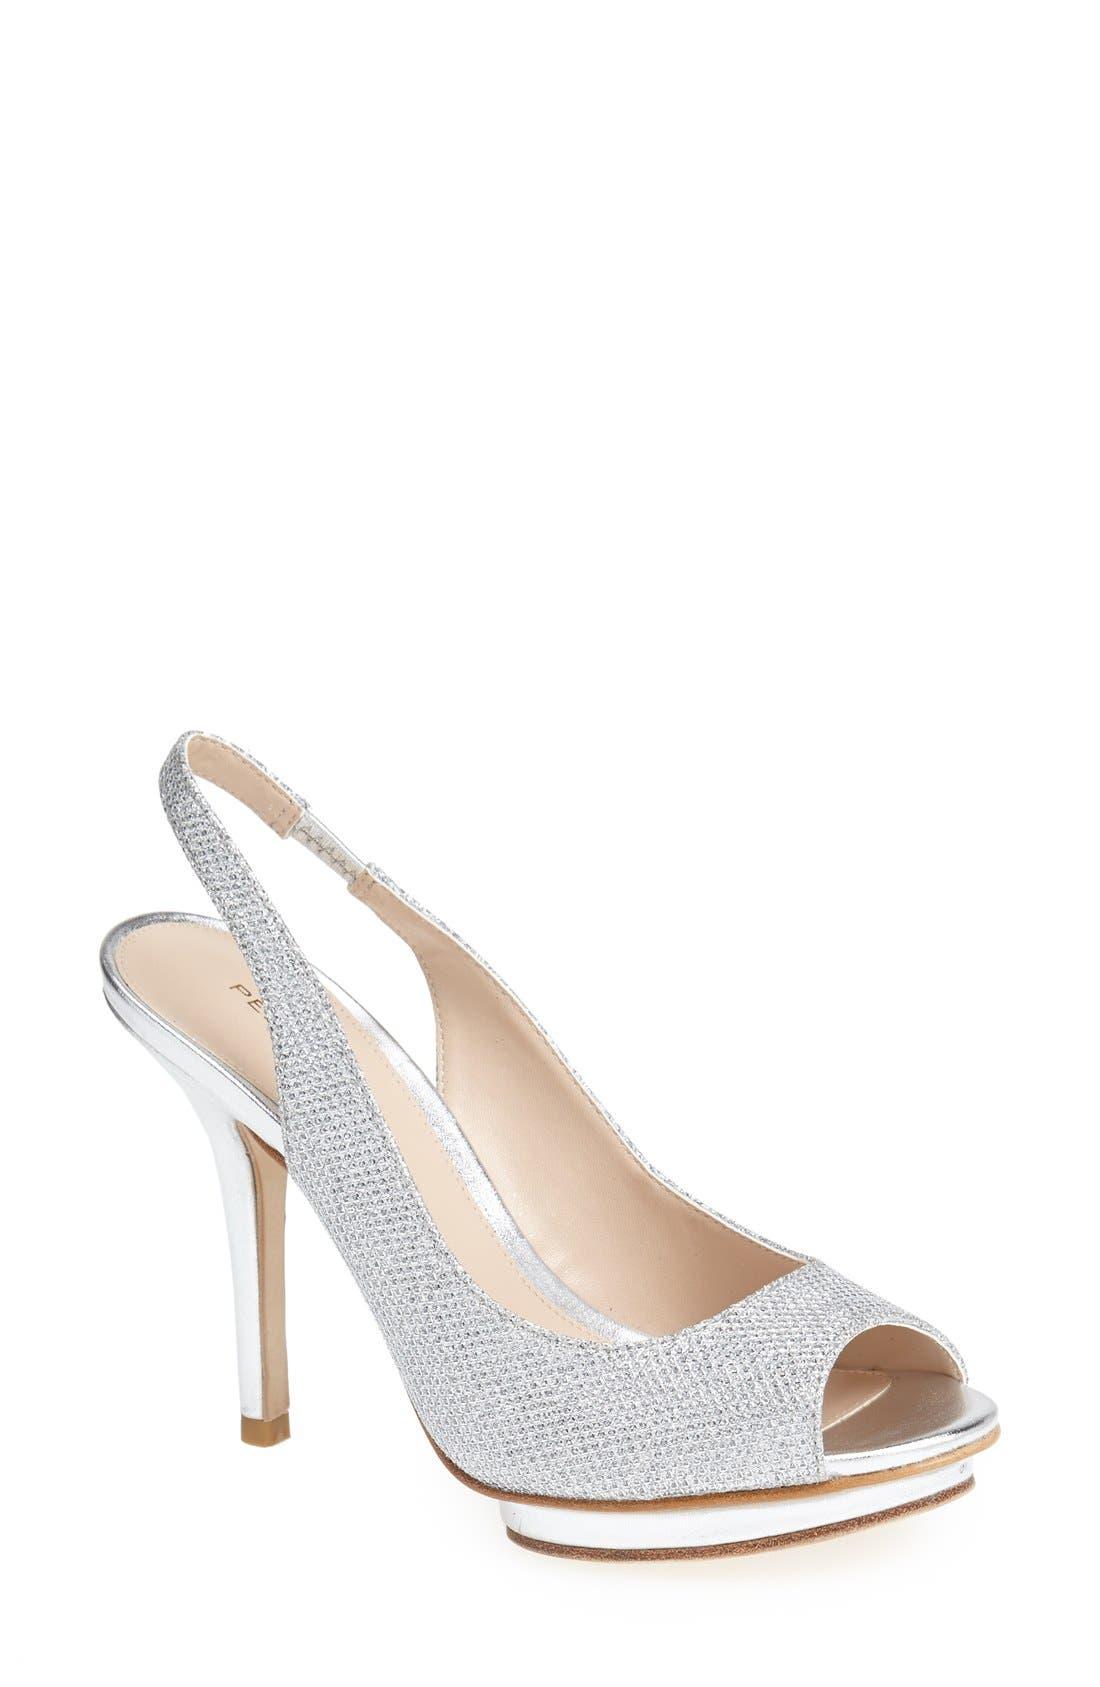 'Rivka' Open Toe Platform Slingback Sandal,                         Main,                         color, Silver Metallic